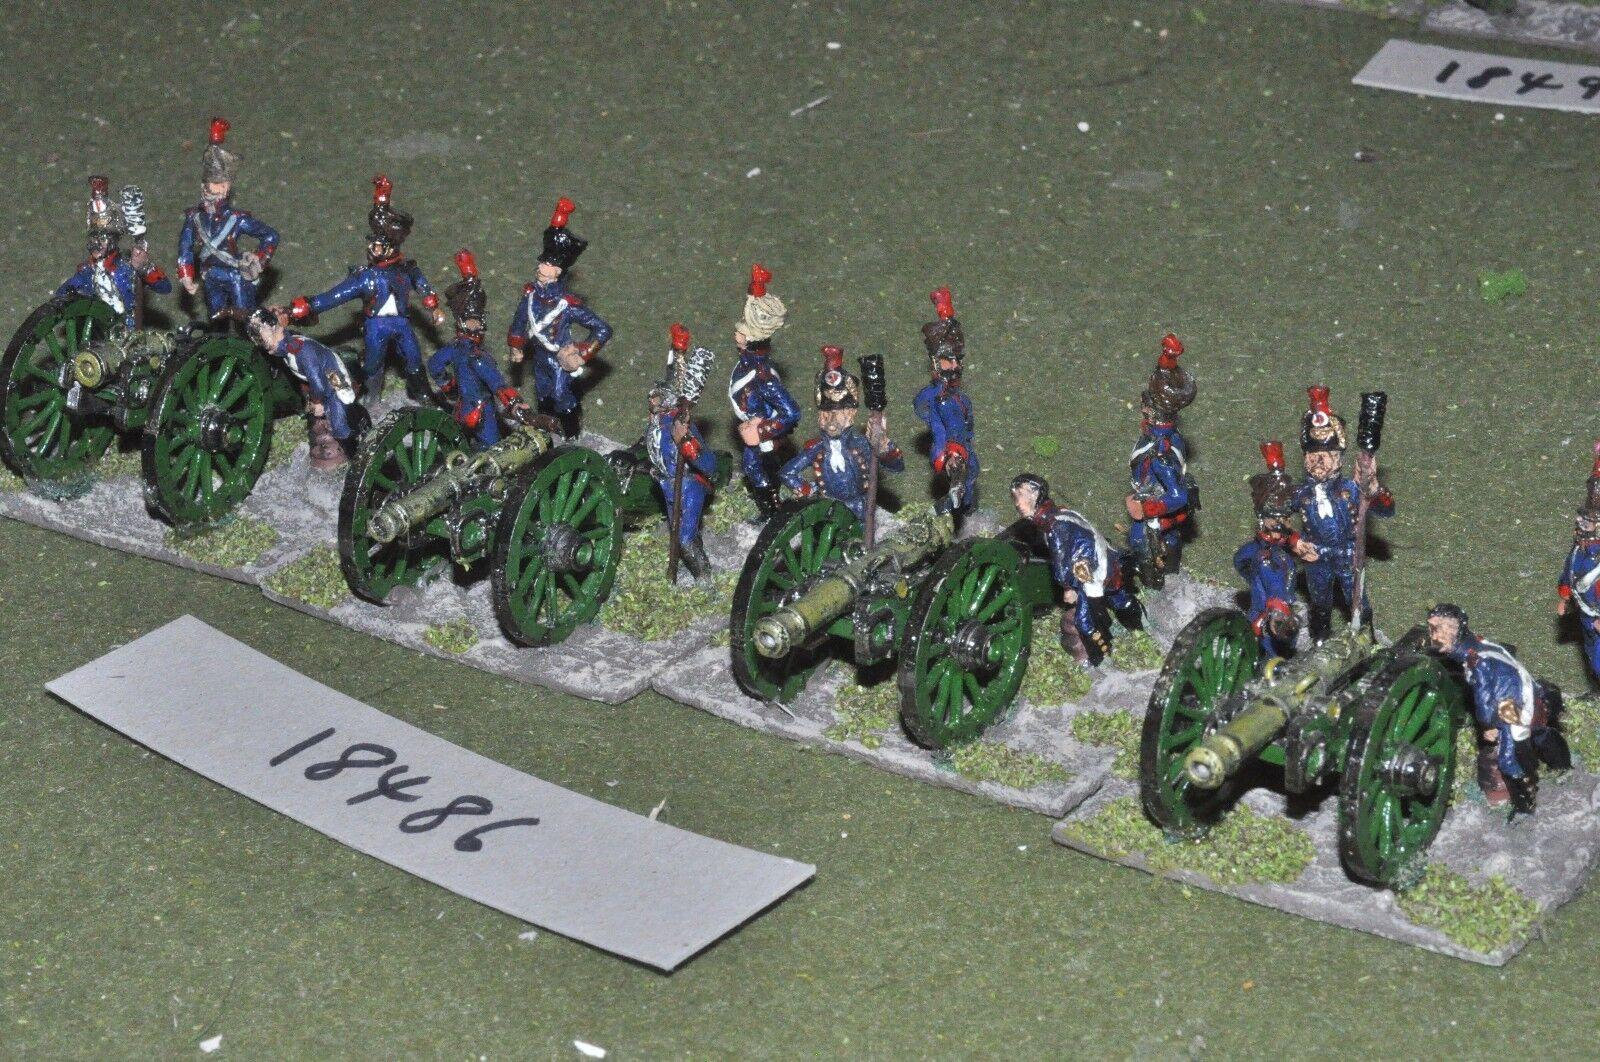 25 mm napoléoniennes/fran ais-Artillerie de 4 canons Crews-art Crews-art Crews-art (18486) e34a08